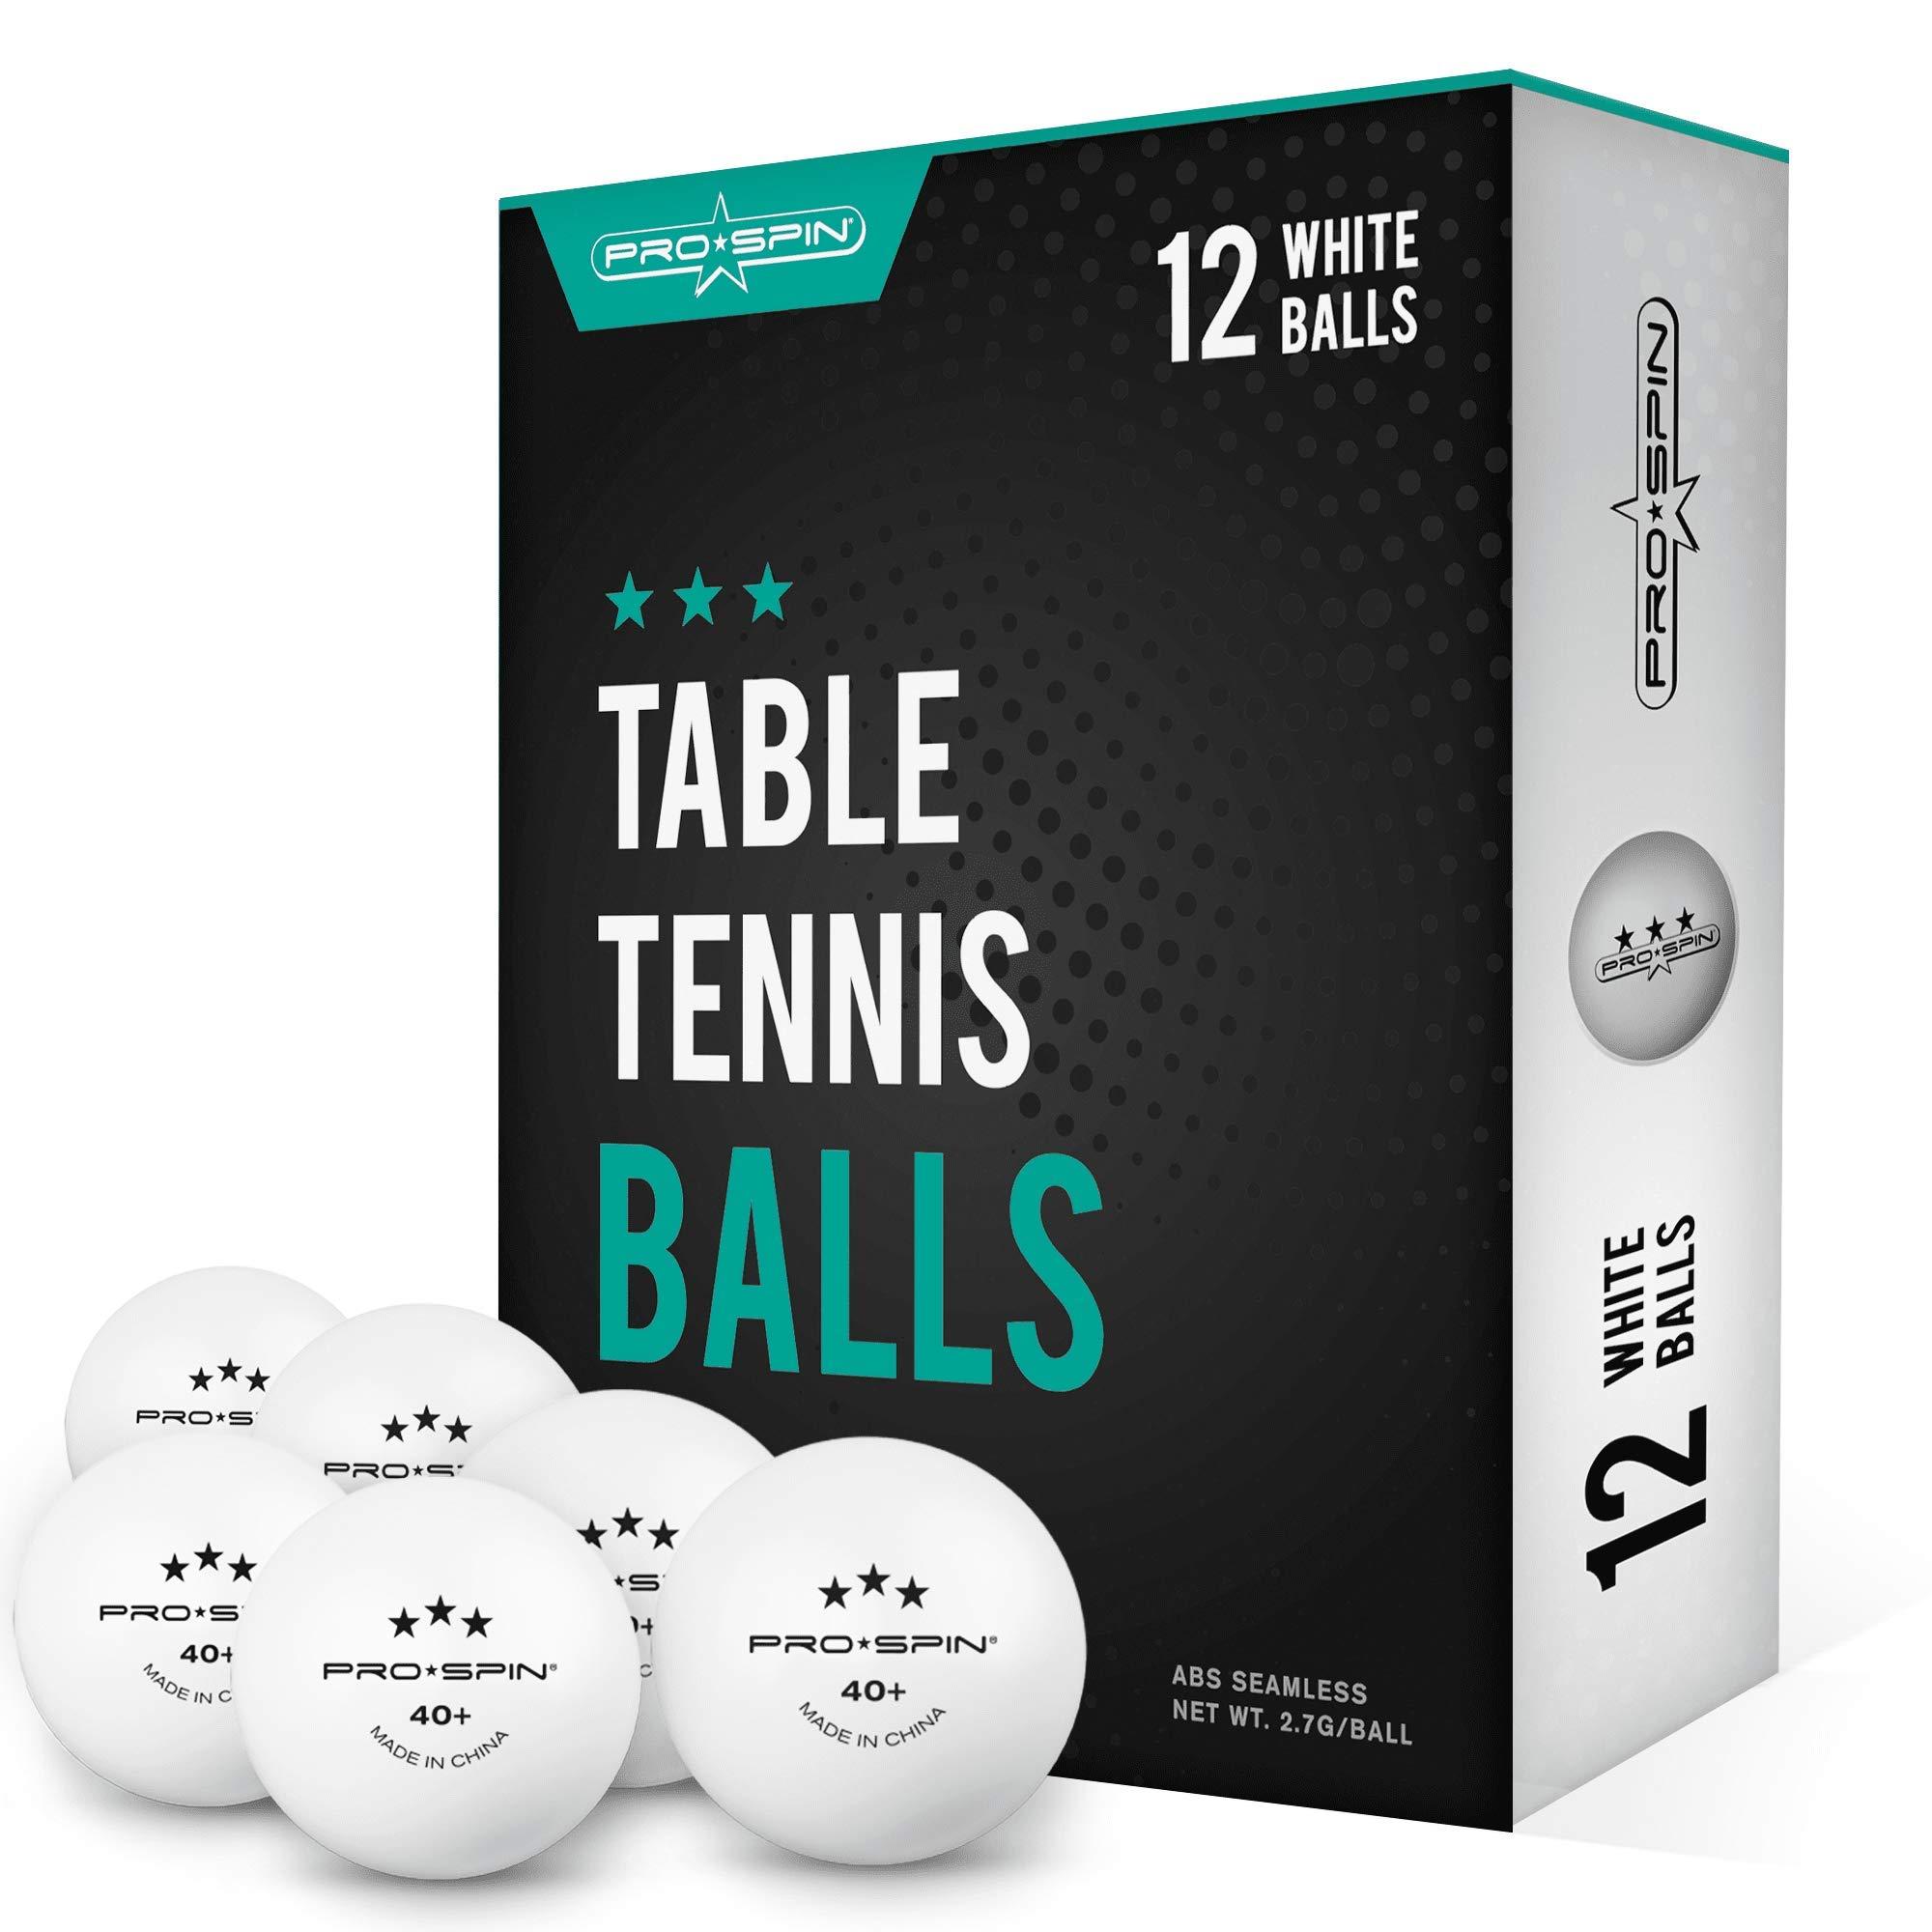 12 Pelotas de Ping Pong 3 Estrellas PRO SPIN Blancas